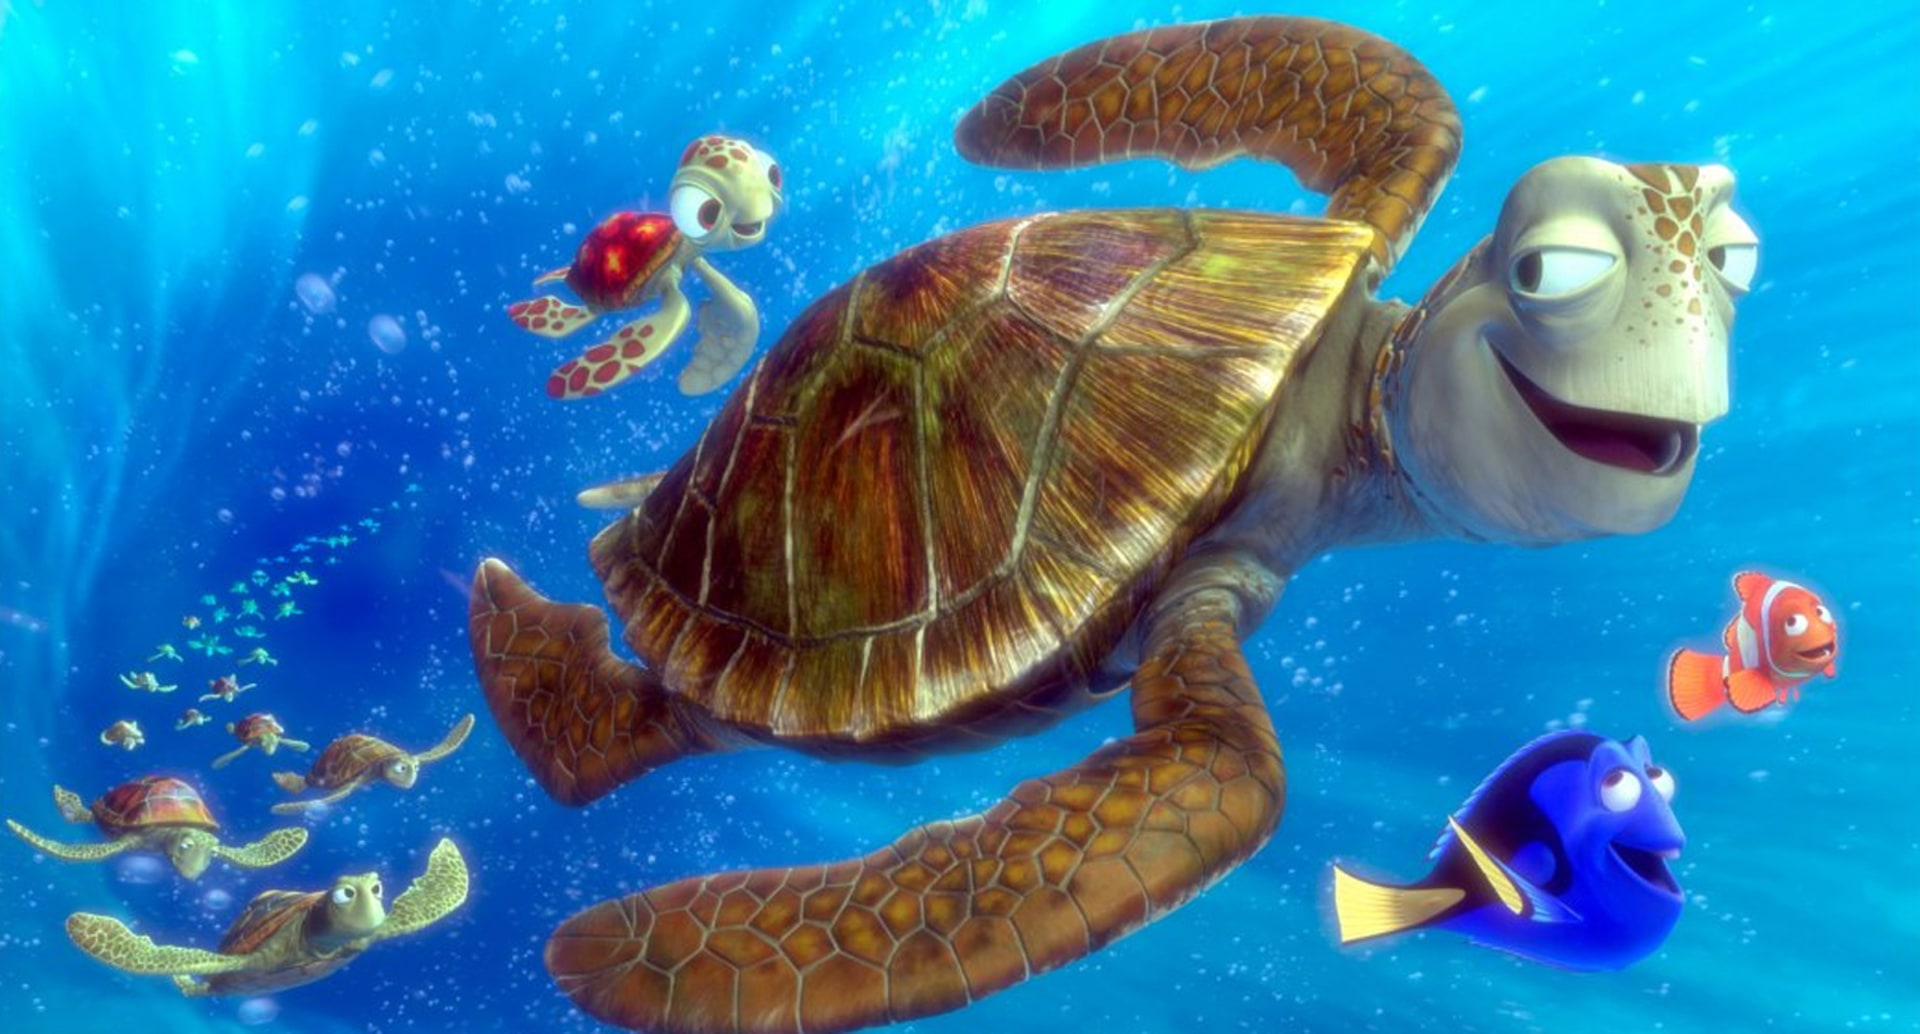 Warning turtles amp tortoises inc - Animated Films Take Flight